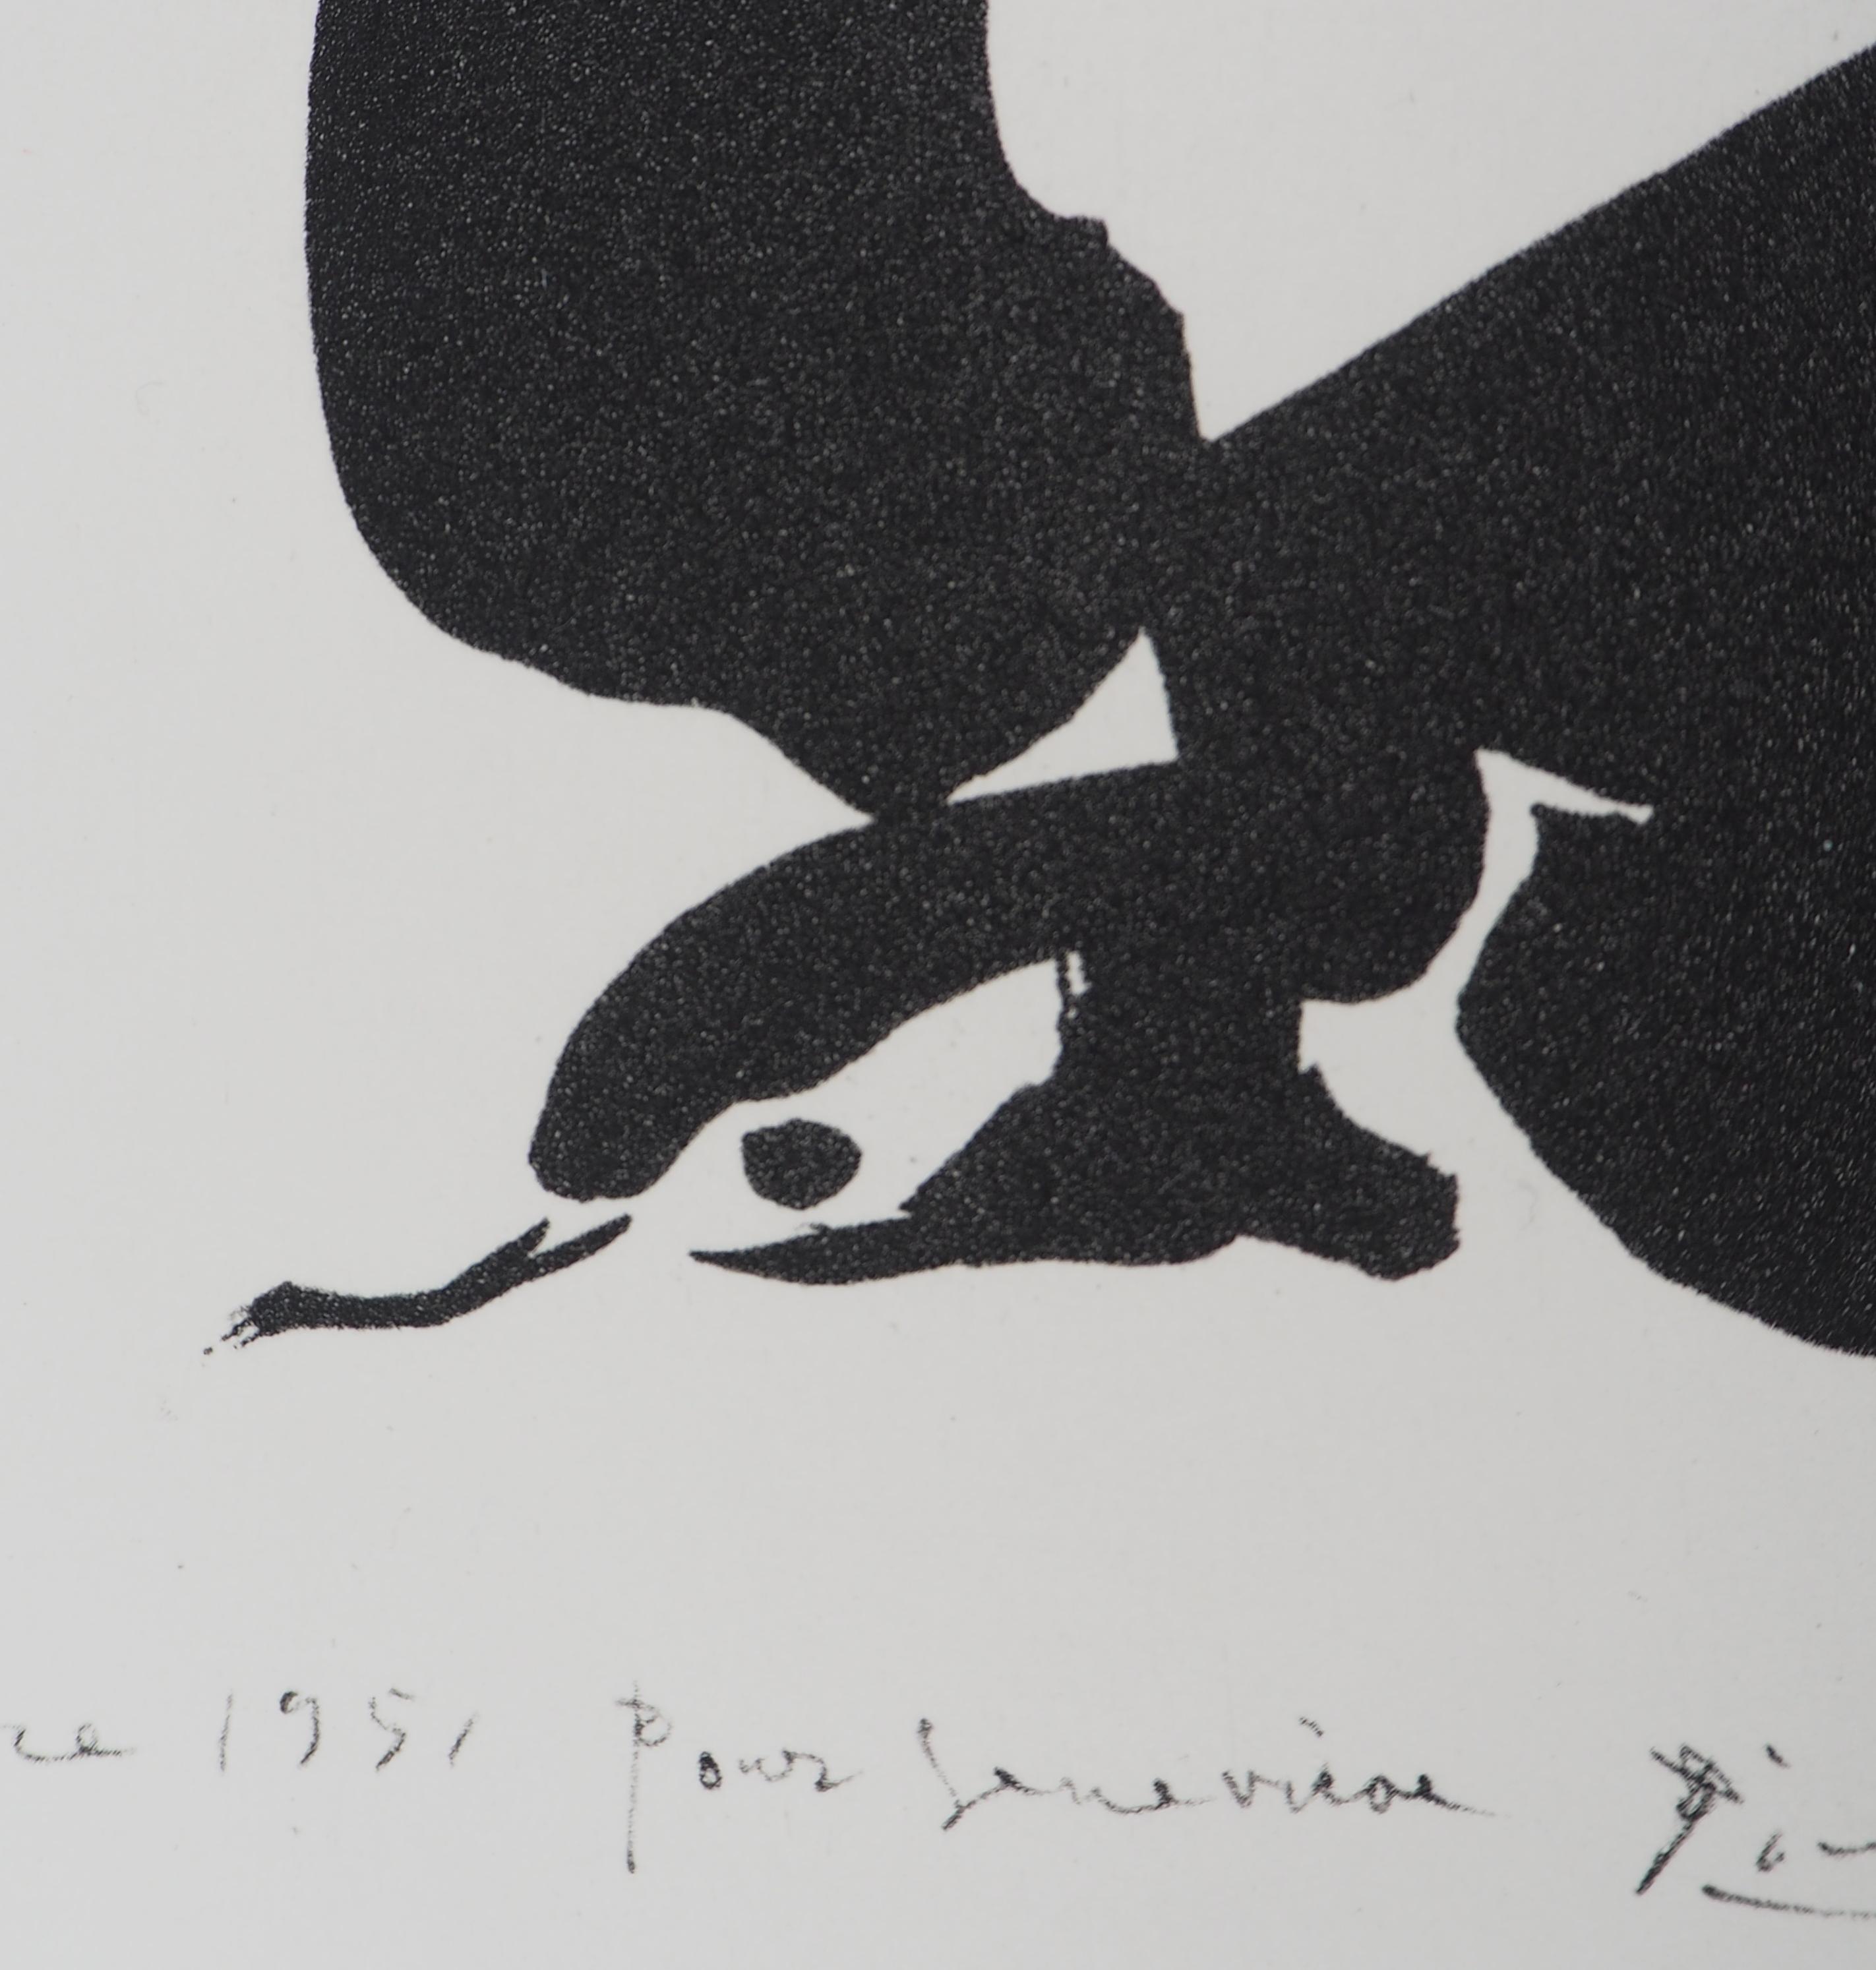 Petit Buffet Art Deco pablo picasso (after) - swallow - lithograph - post war